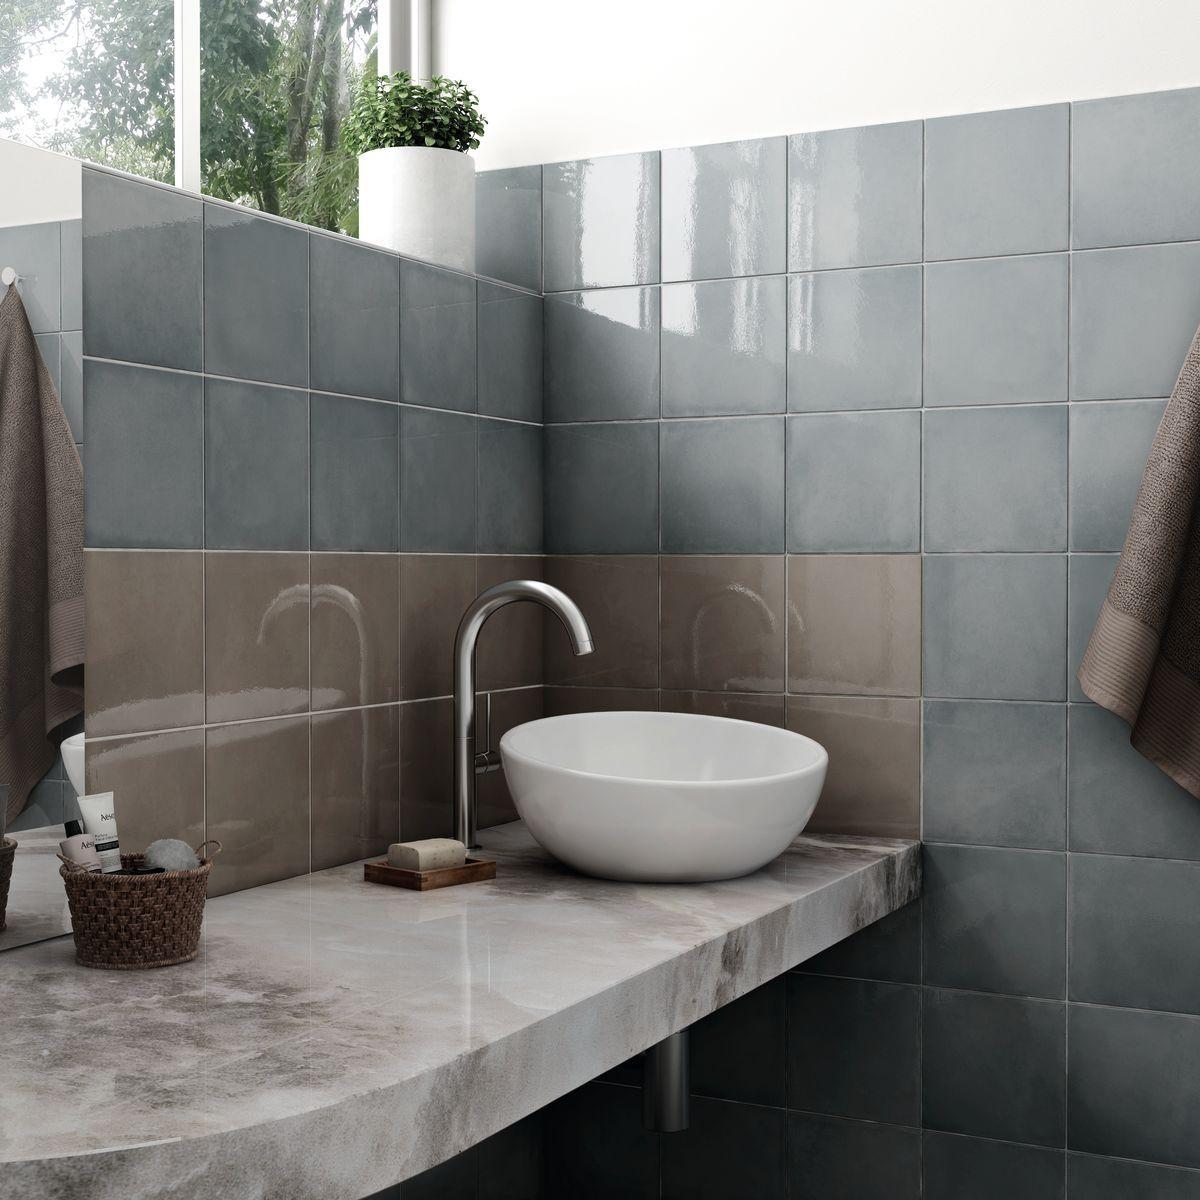 Cadiz Papyrus Decor Wall Tile Clearance Tileflair Blue Wall Tile Bathroom Wall Tiles Bathroom Tile Designs